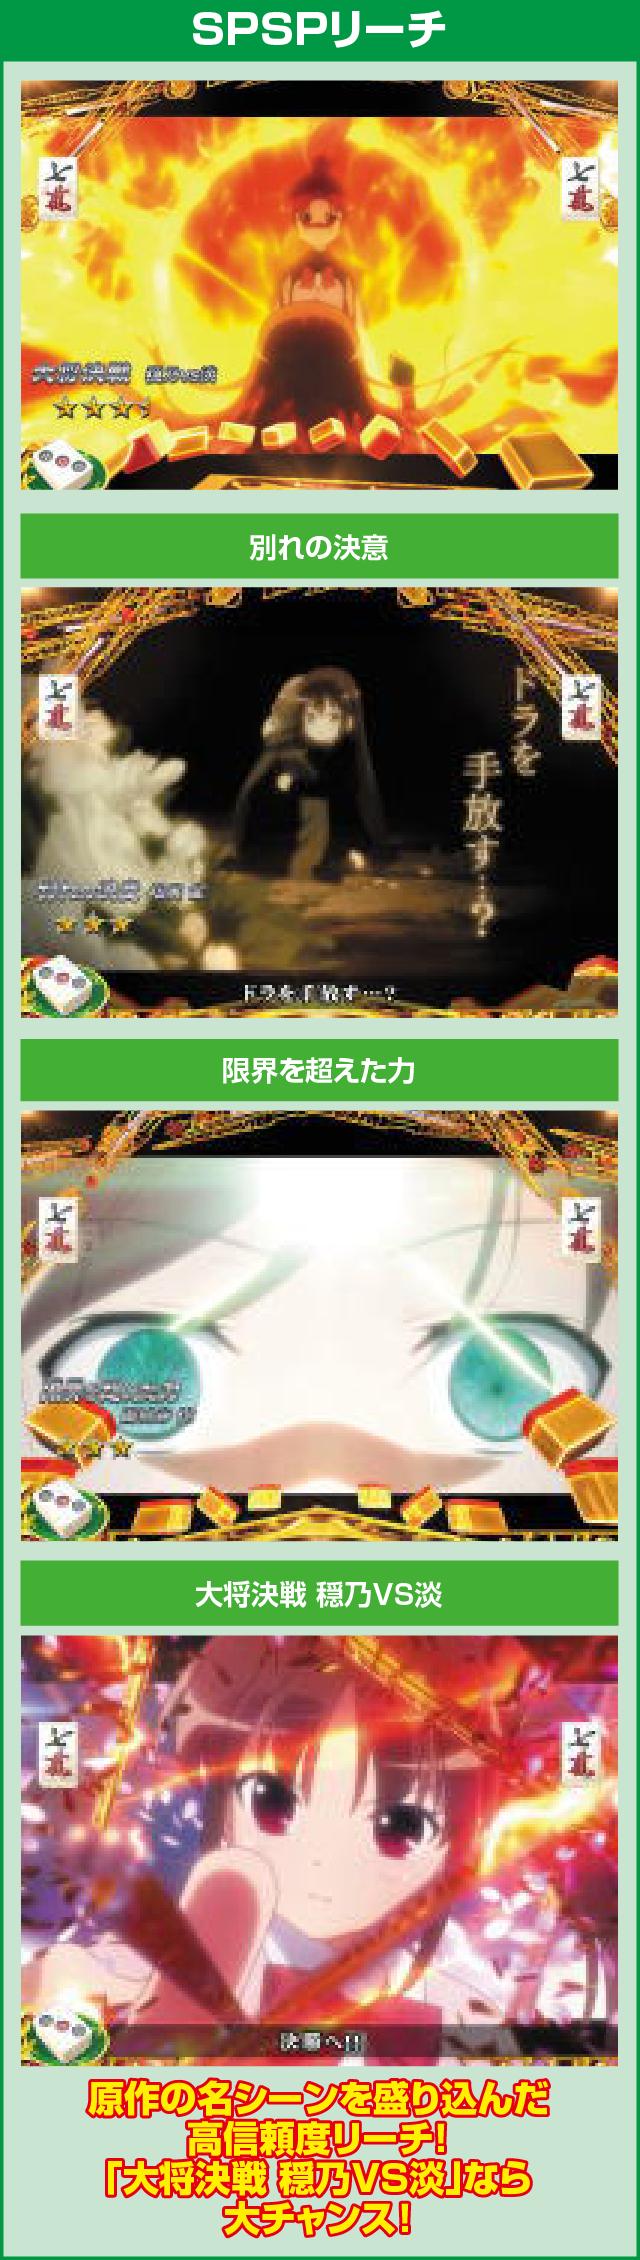 PA咲-Saki-阿知賀編 99バージョンのピックアップポイント